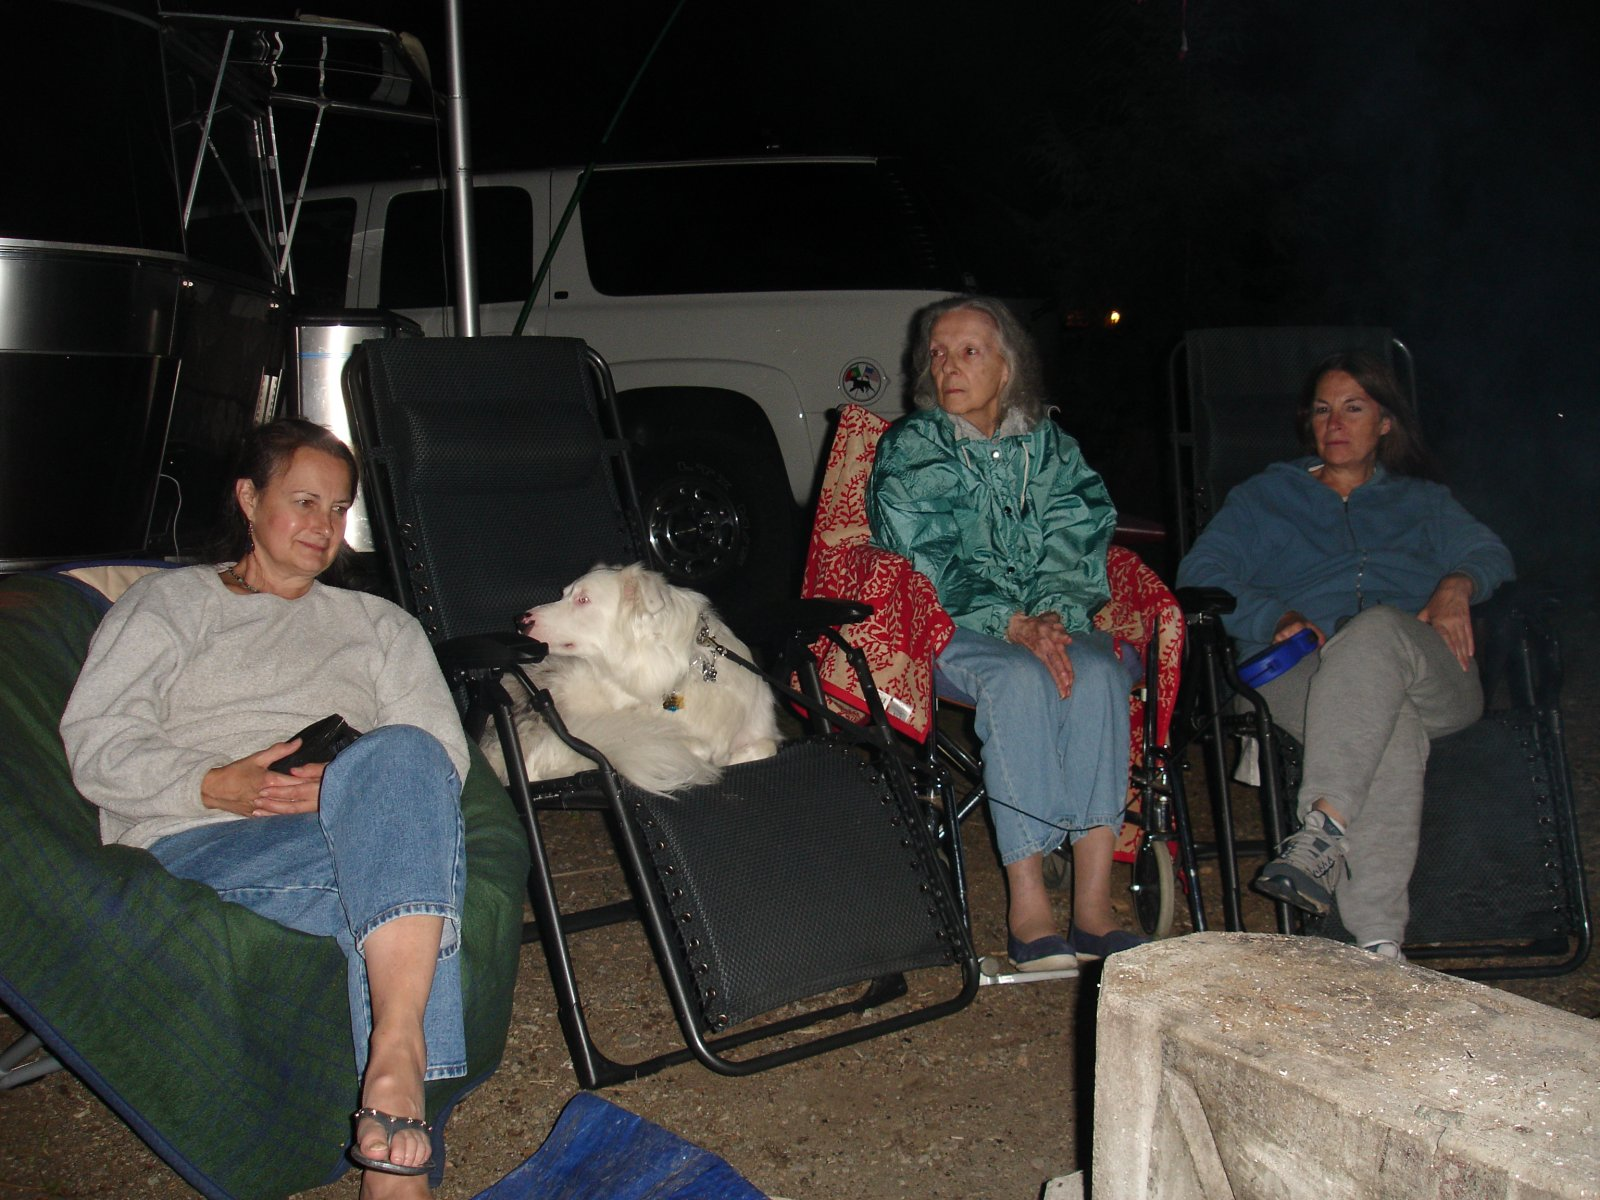 Click image for larger version  Name:Piseco Lake JulyAug 2009 164.jpg Views:90 Size:298.8 KB ID:93285